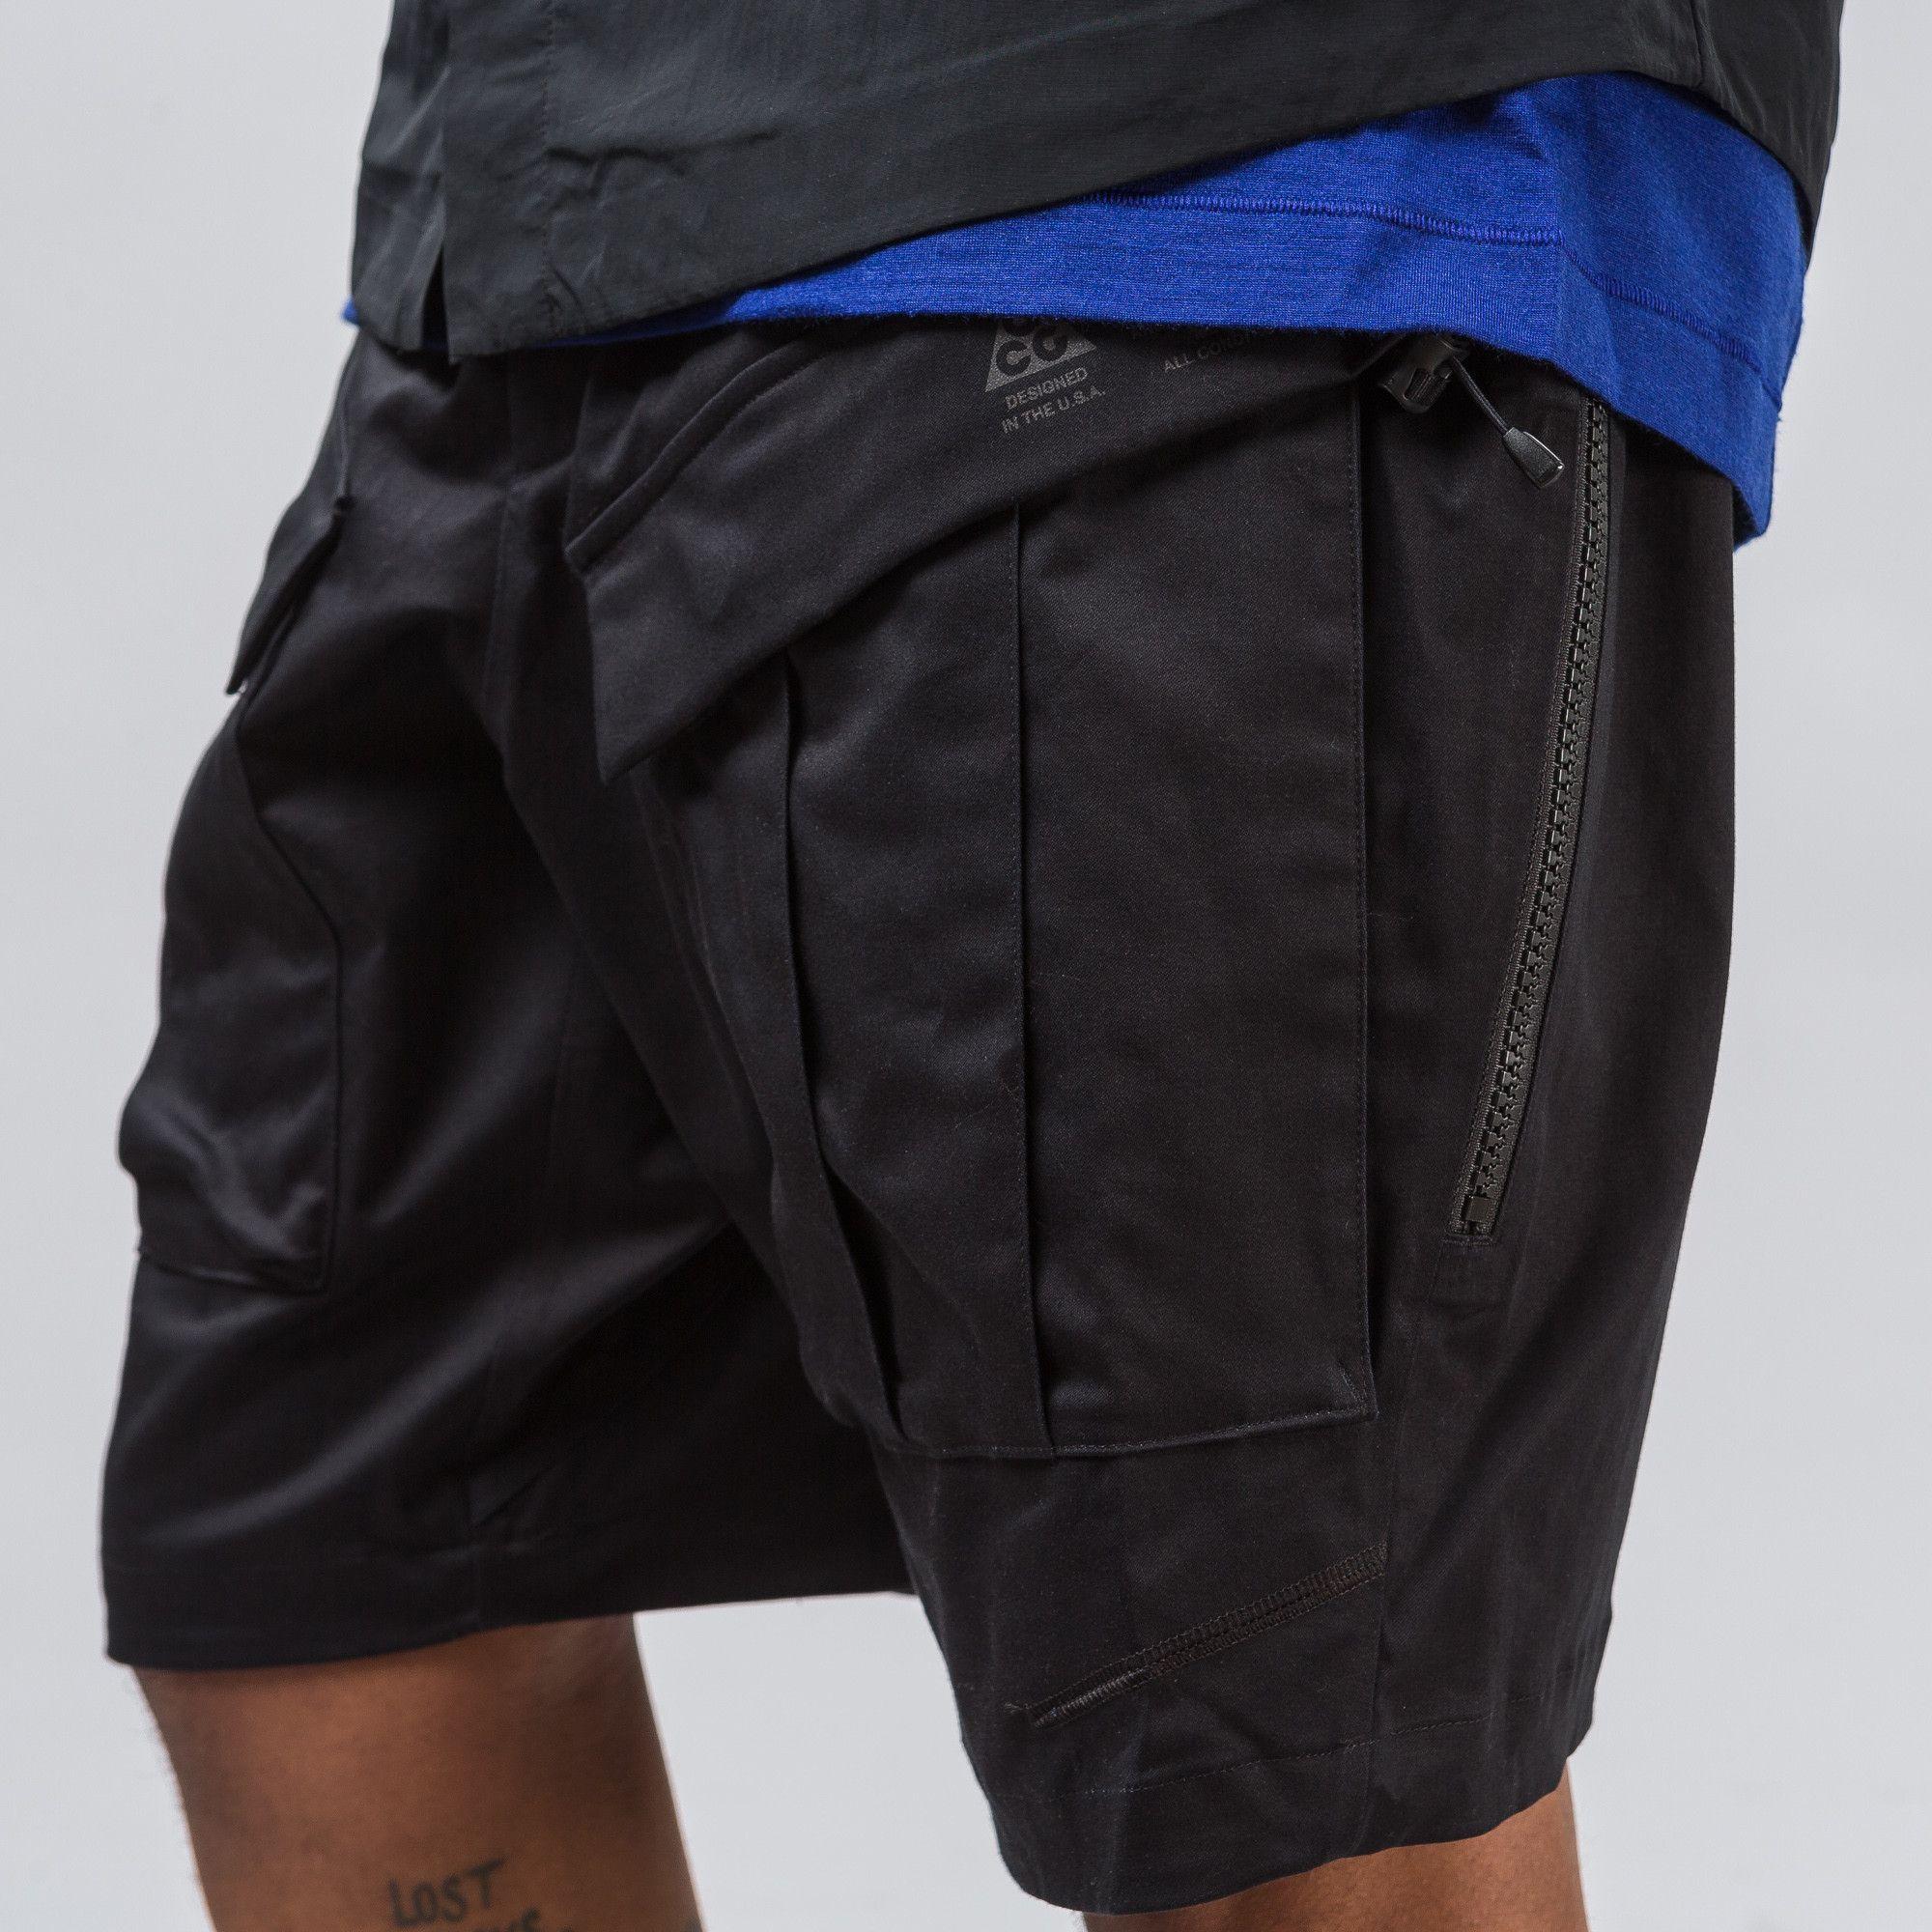 super popular 50d45 36990 Nike NikeLab ACG Cargo Short in Black - Notre